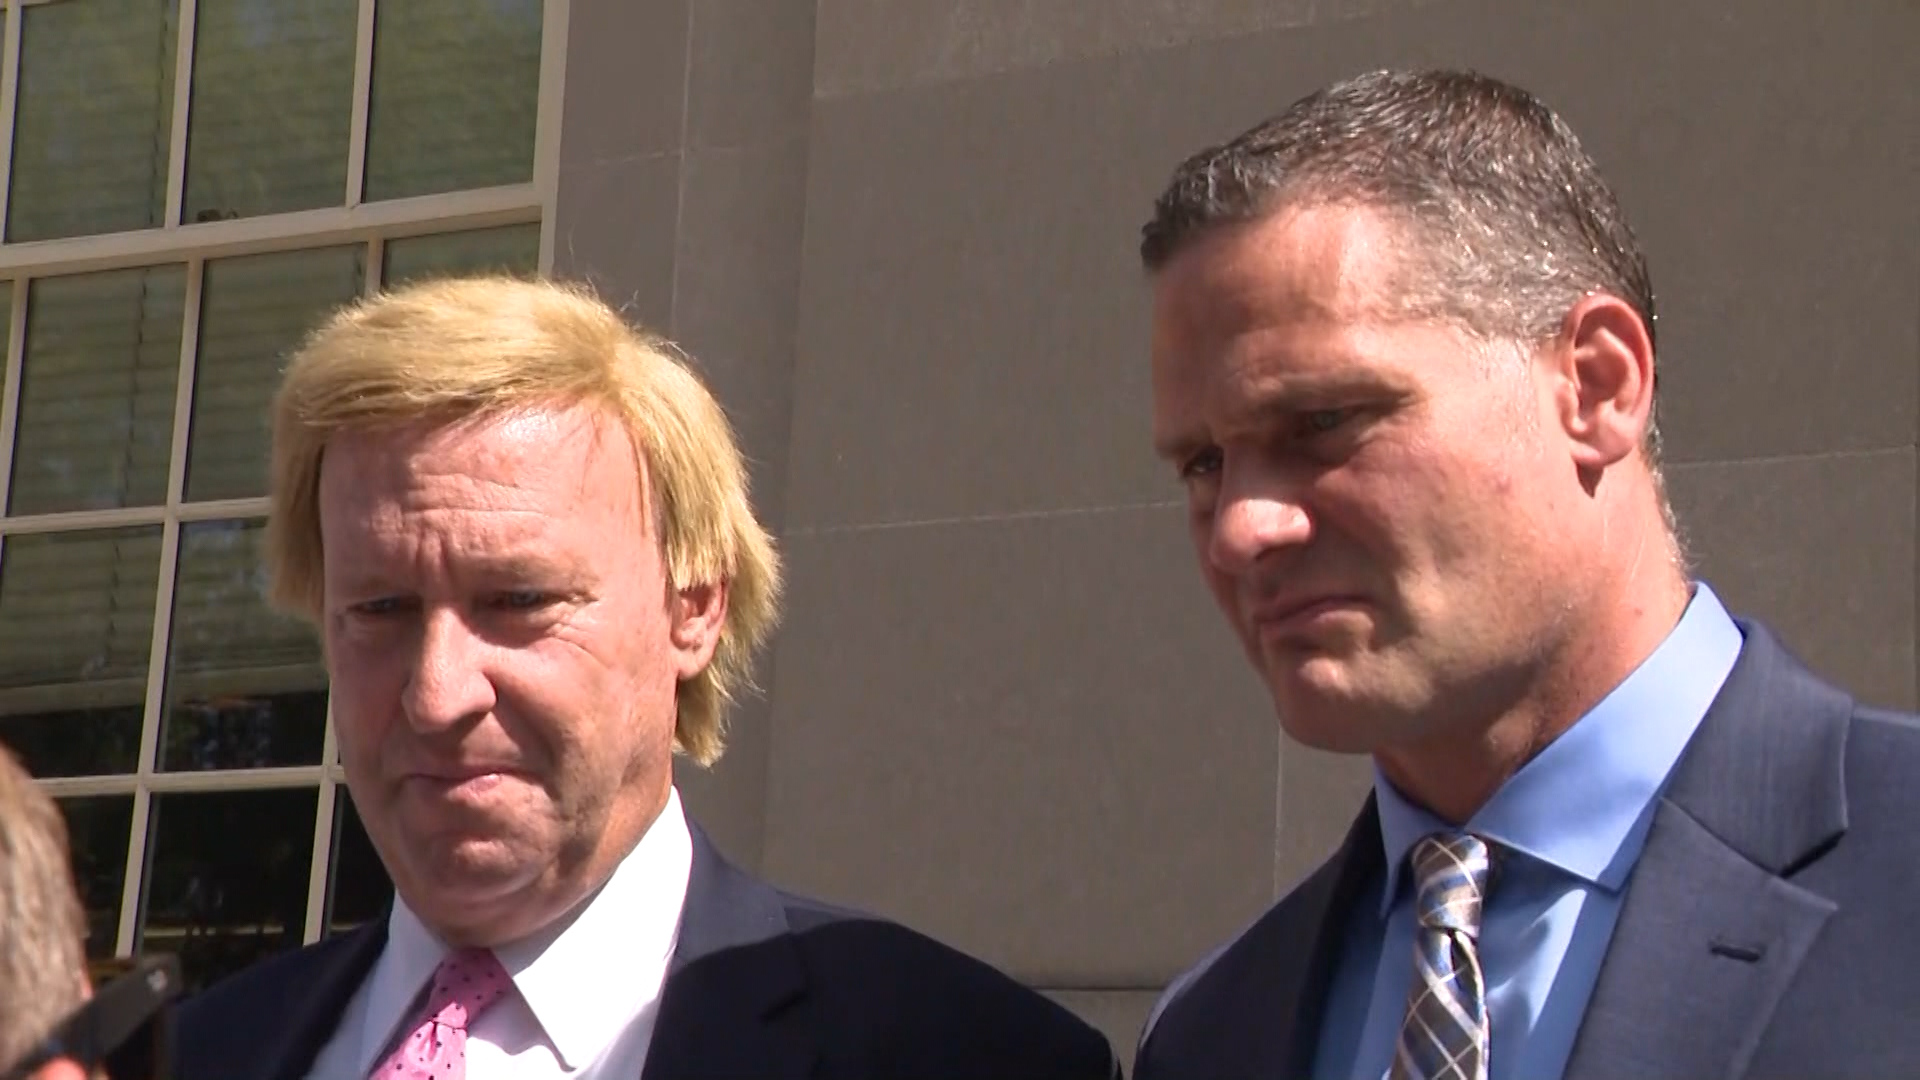 Former RI Sen. Doyle enters initial plea in check fraud case